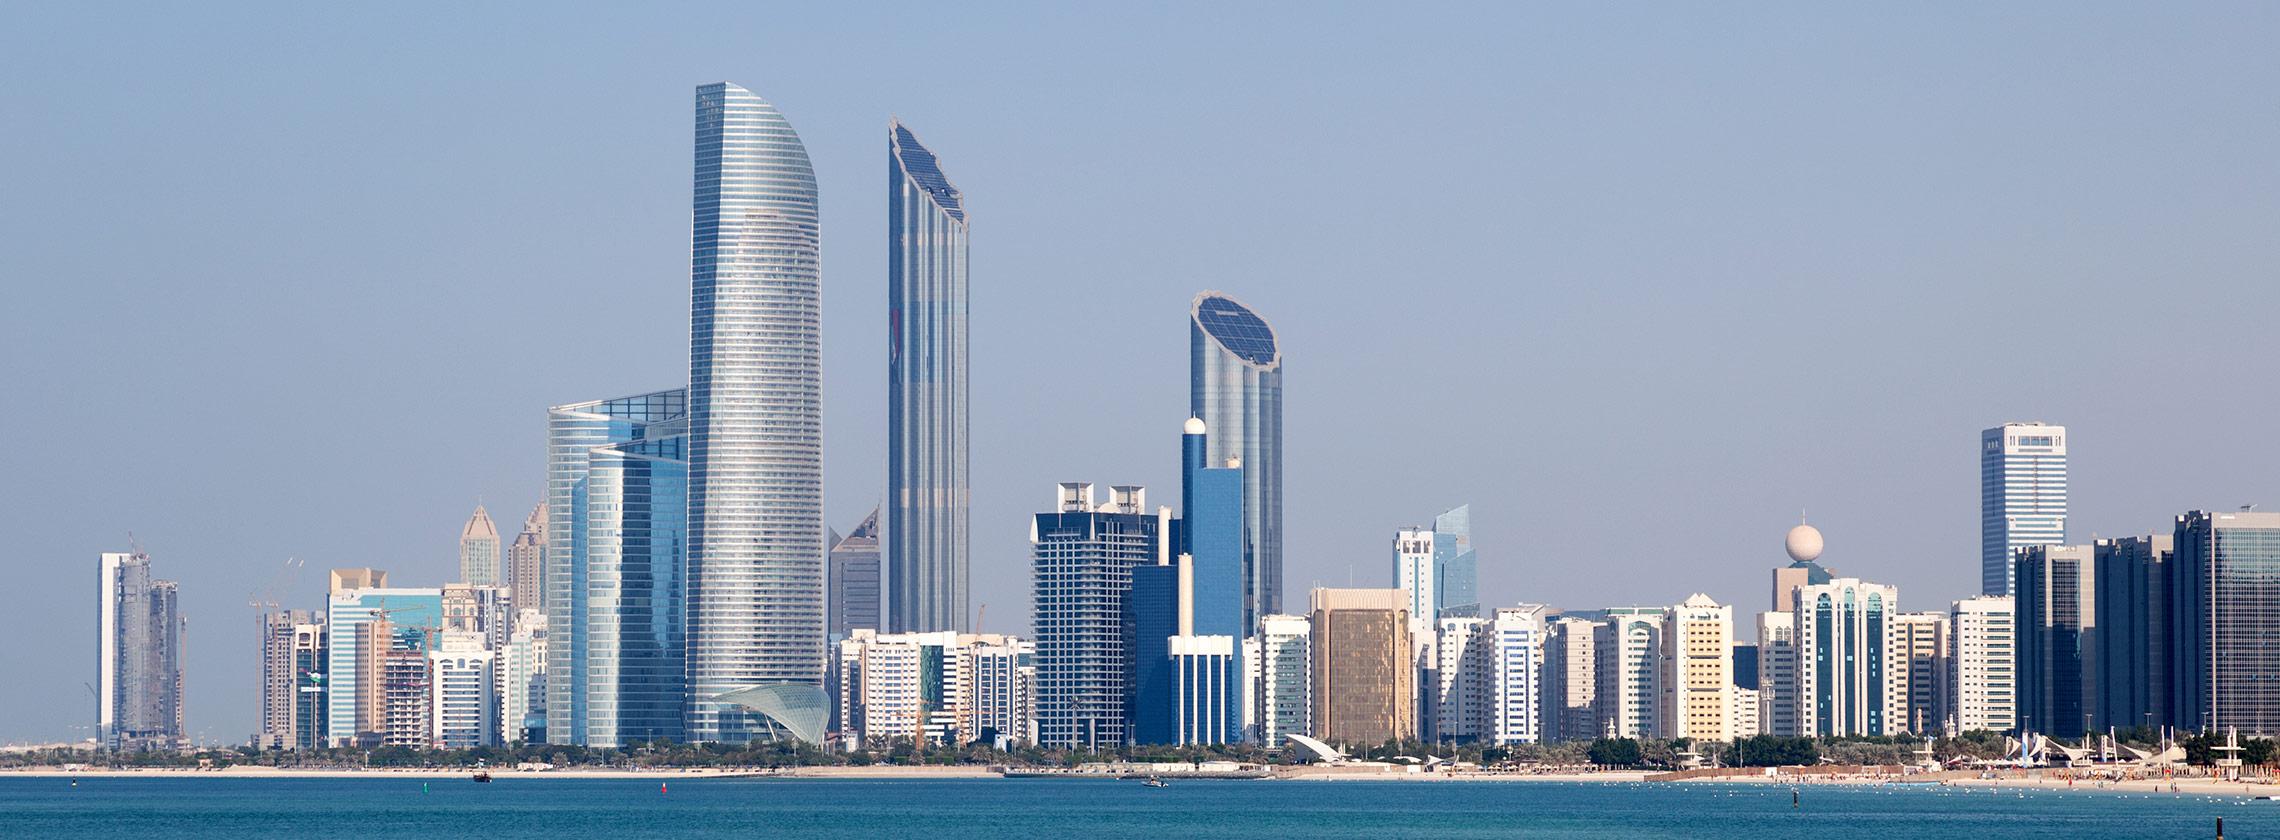 abu-dhabi-global-cities-of-the-future-2021